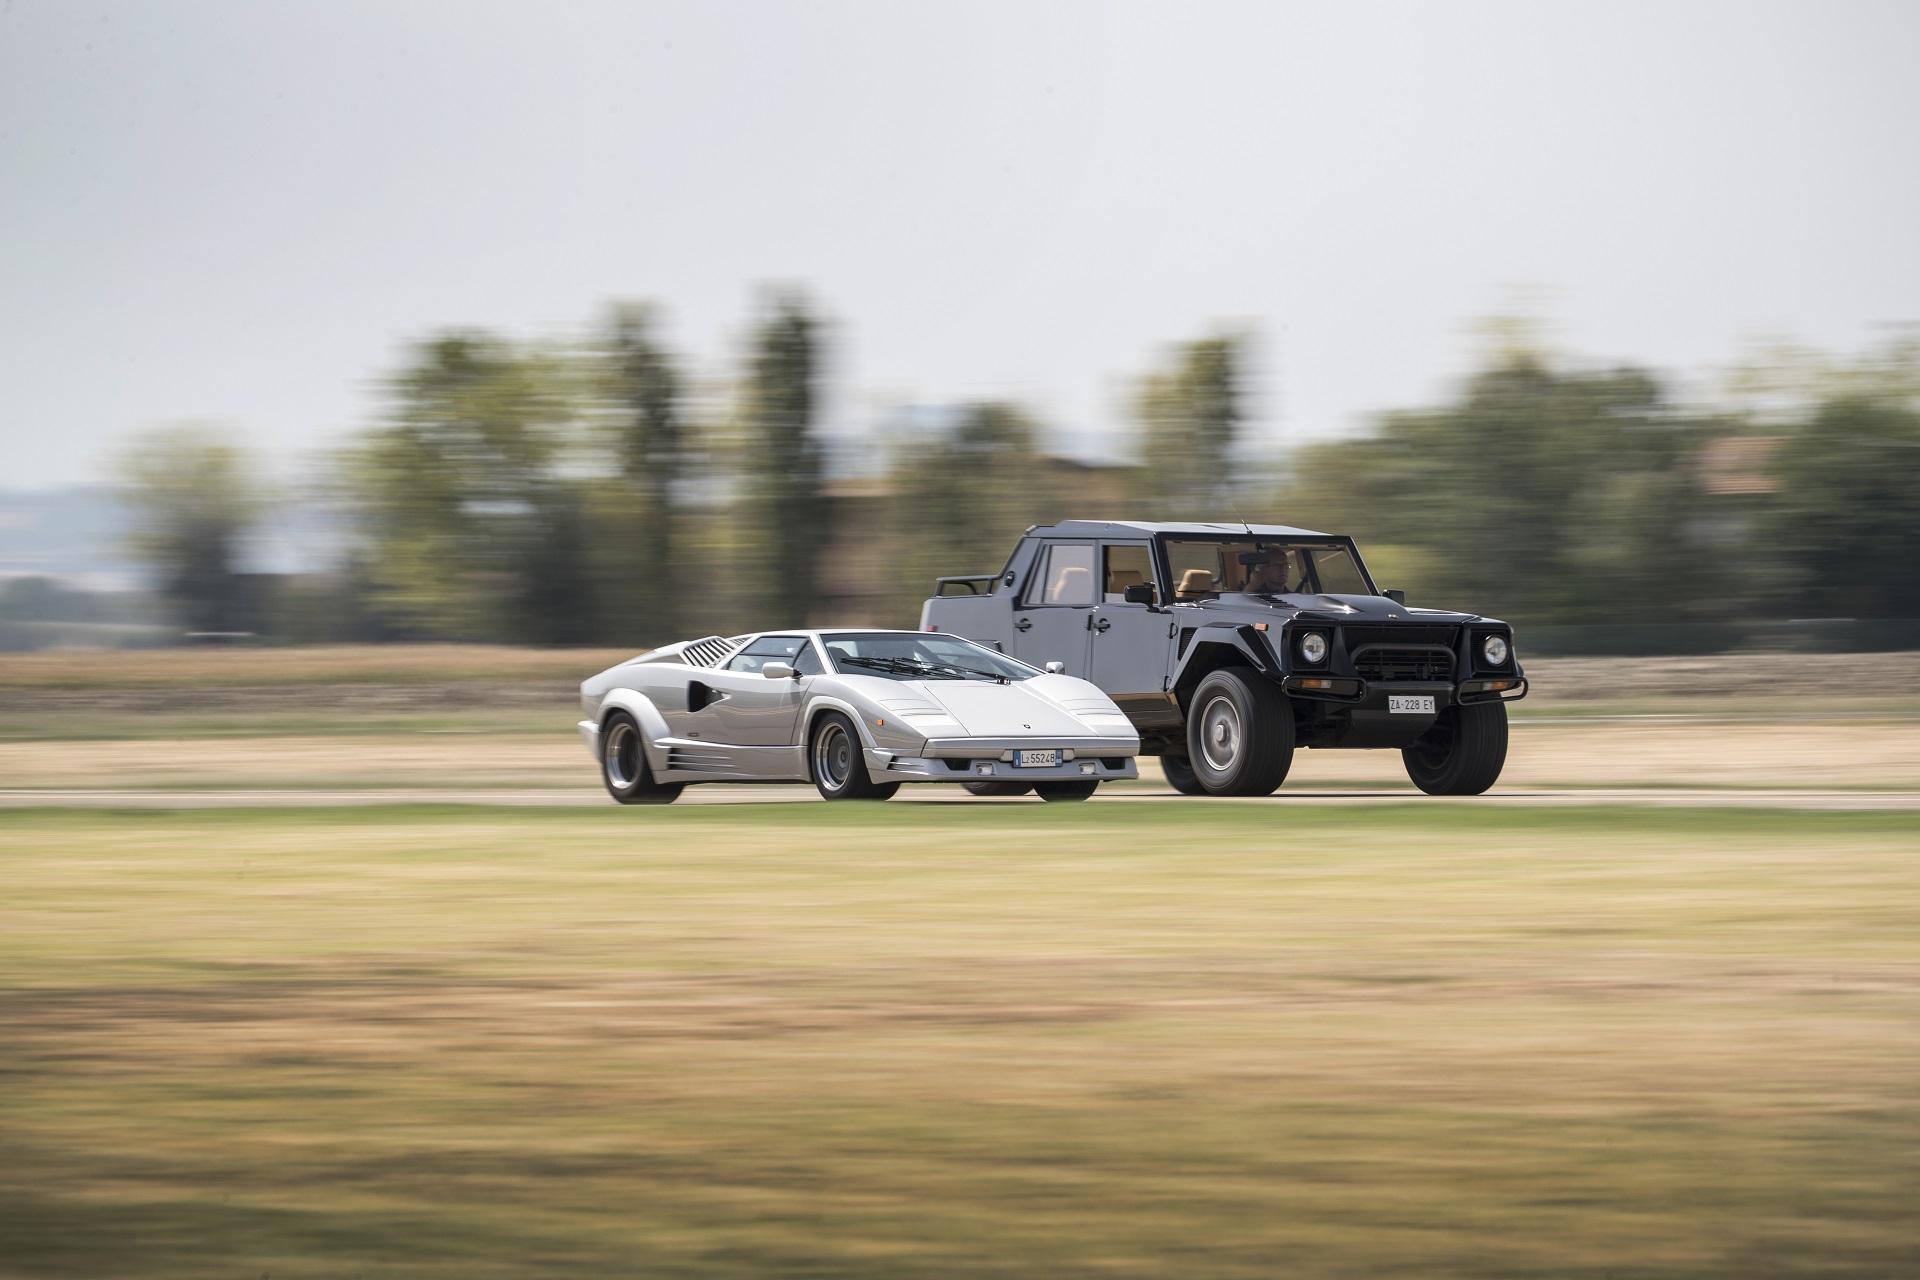 Lamborghini LM002 and Countach